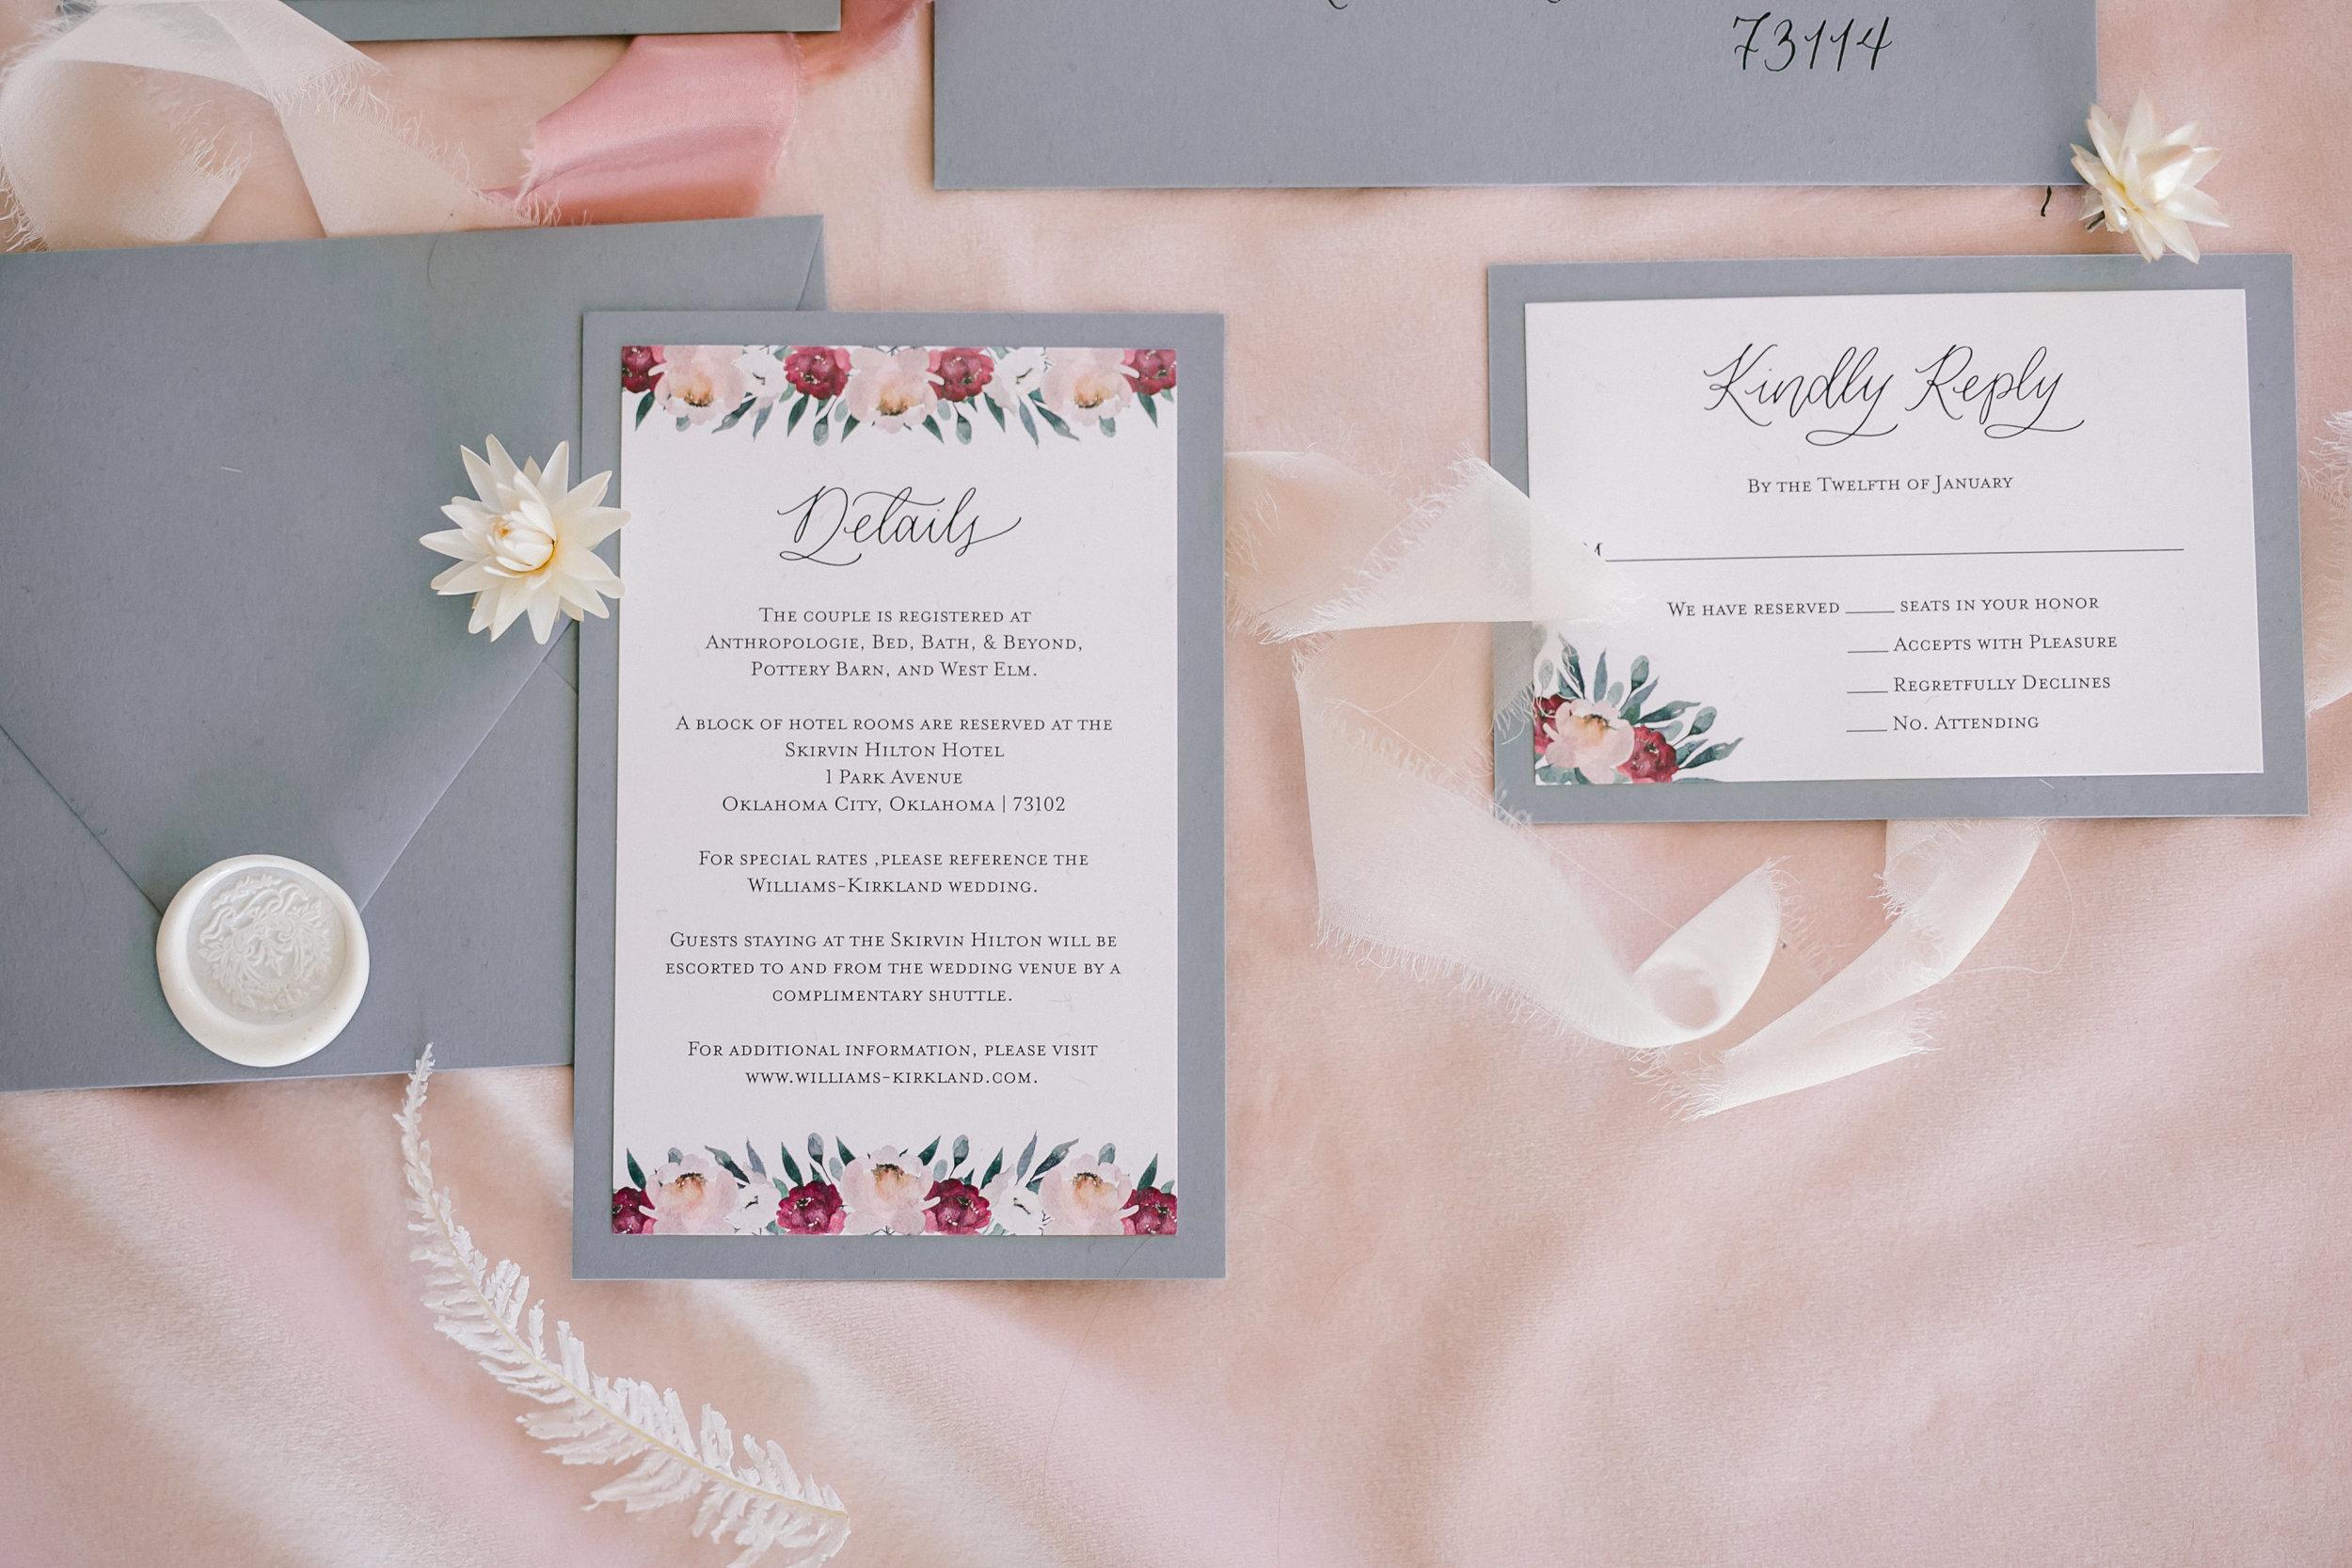 Festivities-Event-Center-Wedding-Oklahoma-City-Wedding-Photographer-Emily-Nicole-Photo-230.jpg